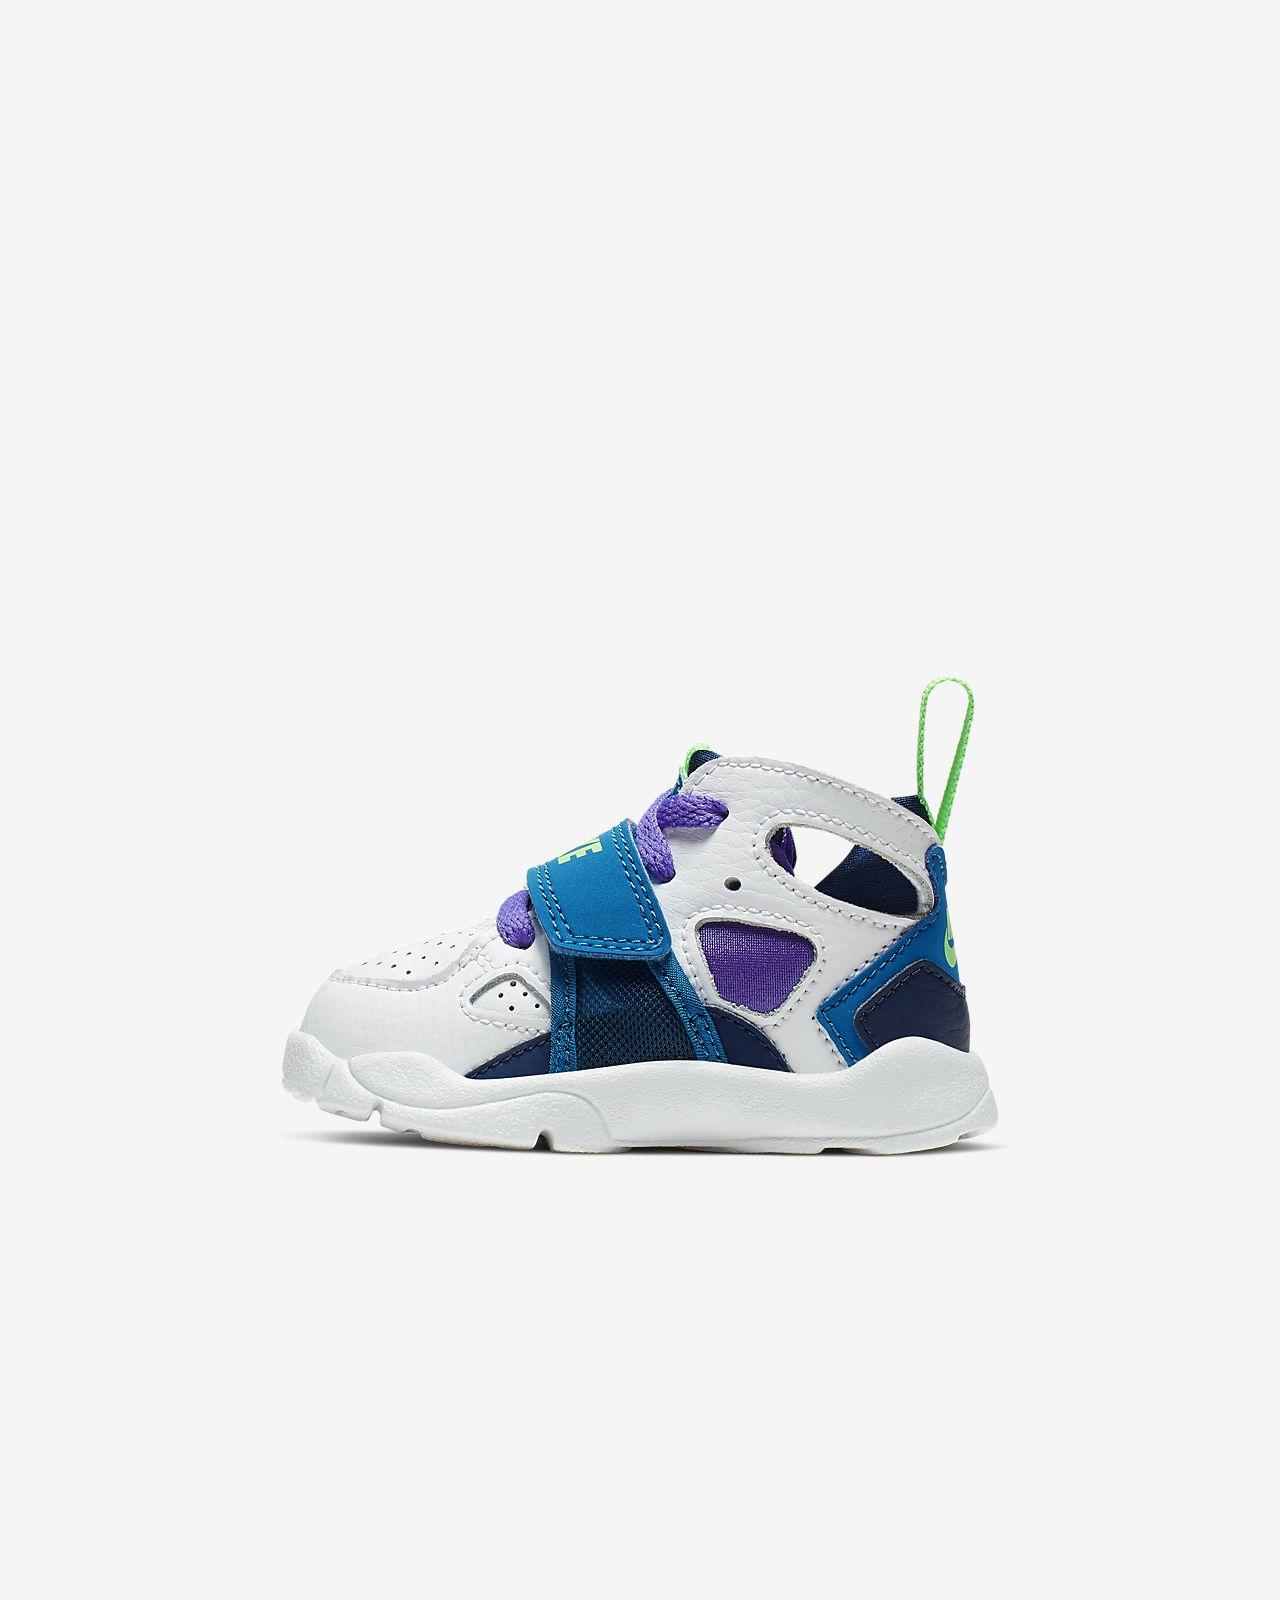 Nike Trainer Huarache Baby/Toddler Shoe